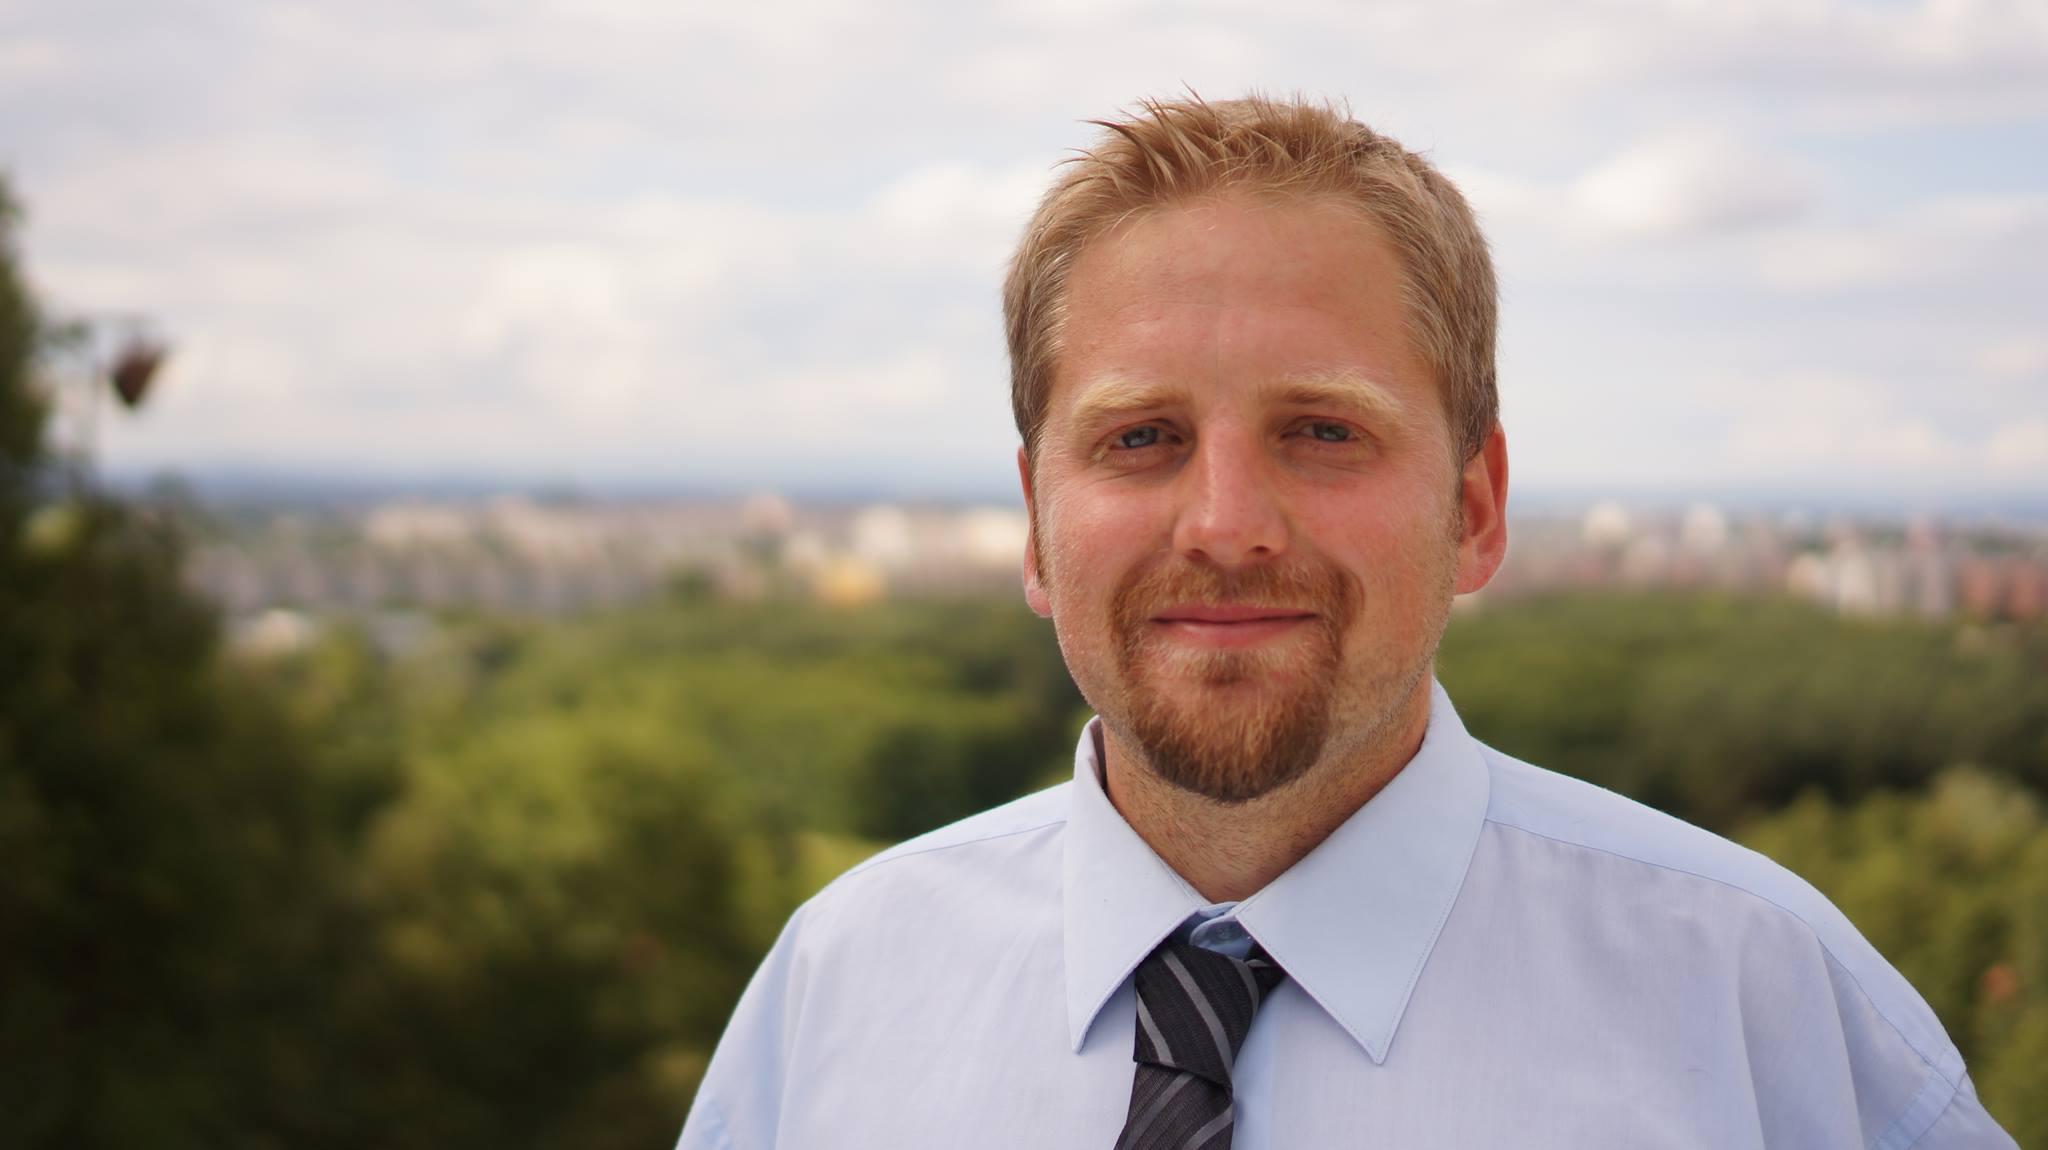 Вит Едличка — самопровозглашенный президент Либерленда. Фото: Jan Husák